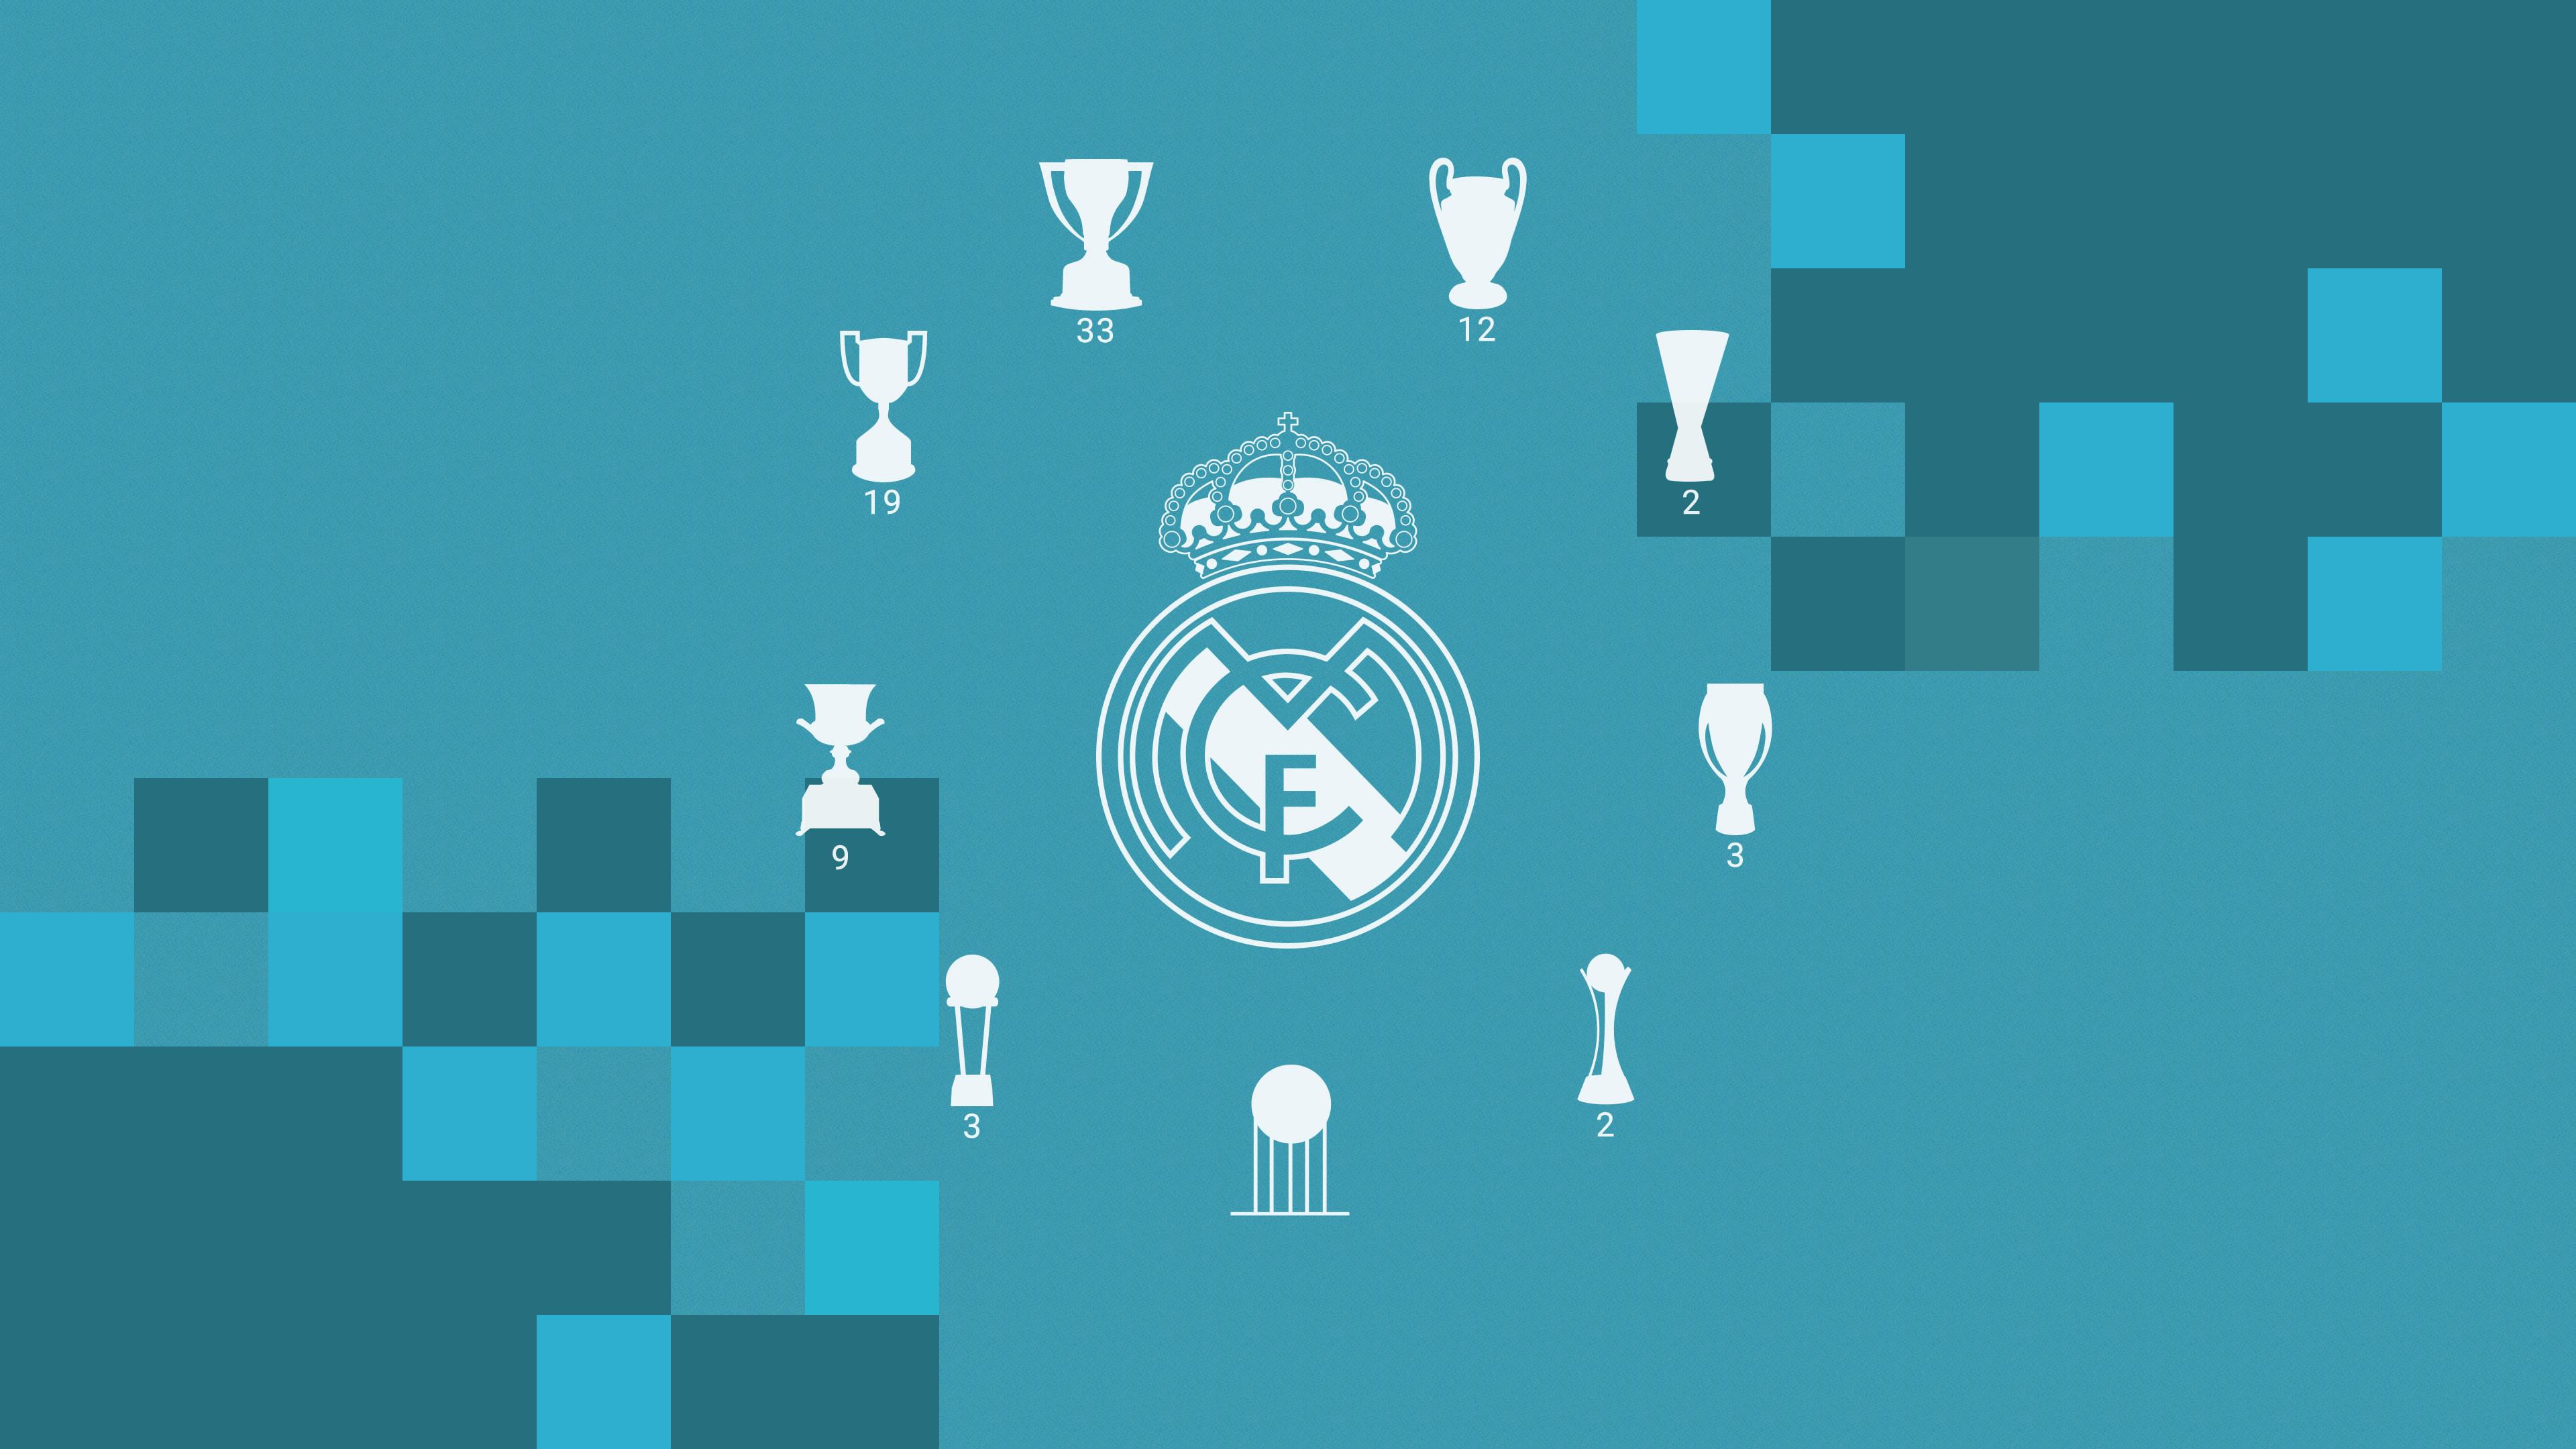 … Real Madrid Third Wallpaper (2017/18) by khalidvawda